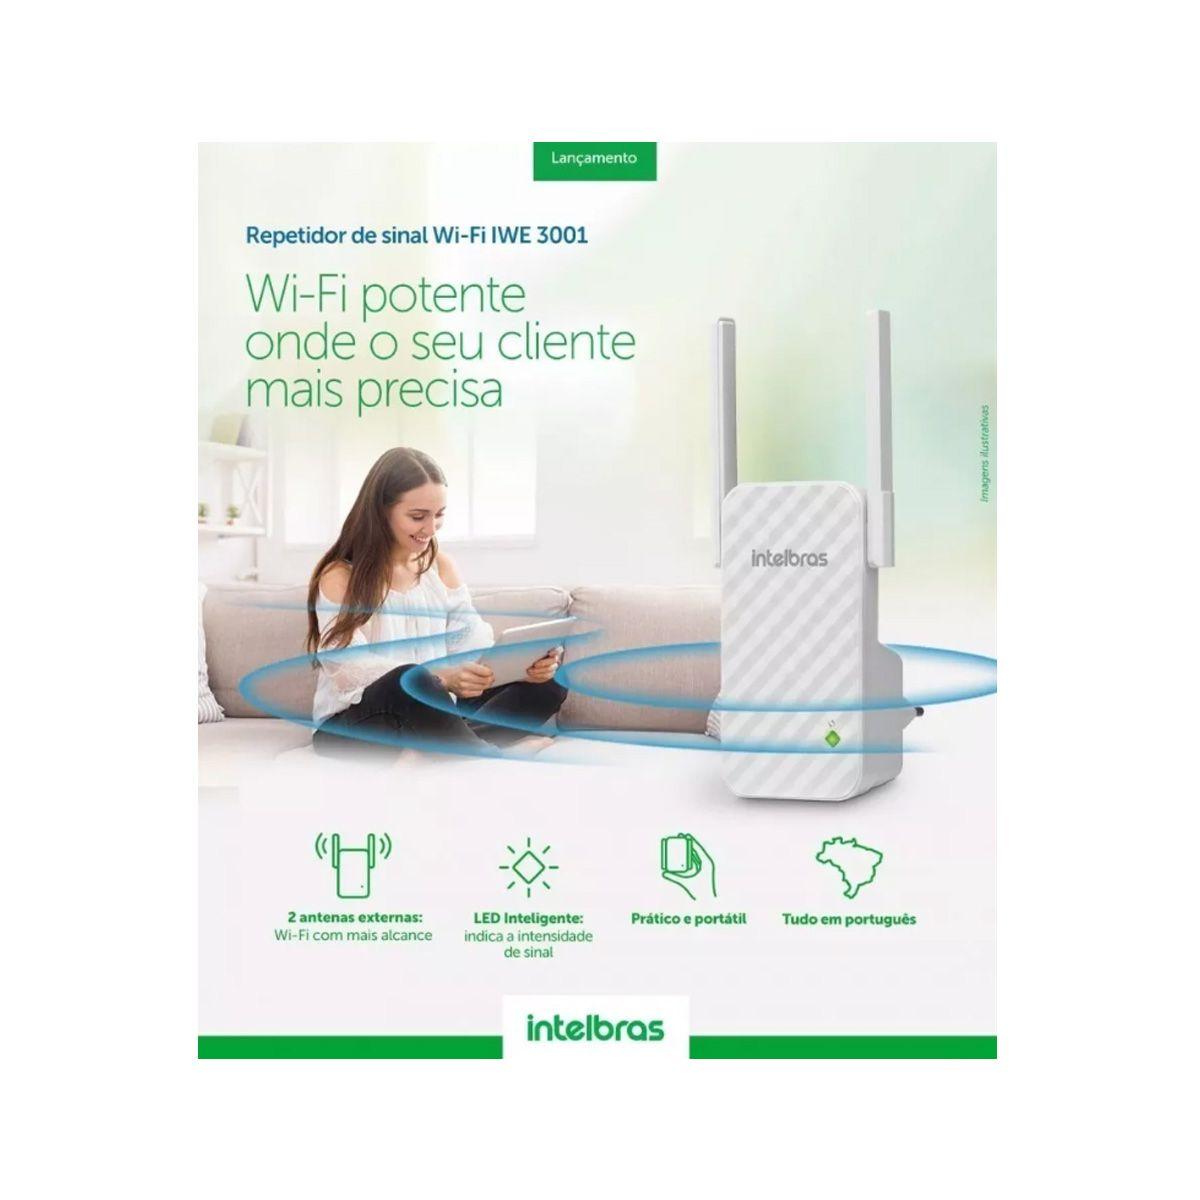 Repetidor Sinal Wireless Intelbras Iwe 3001 Antena Externa